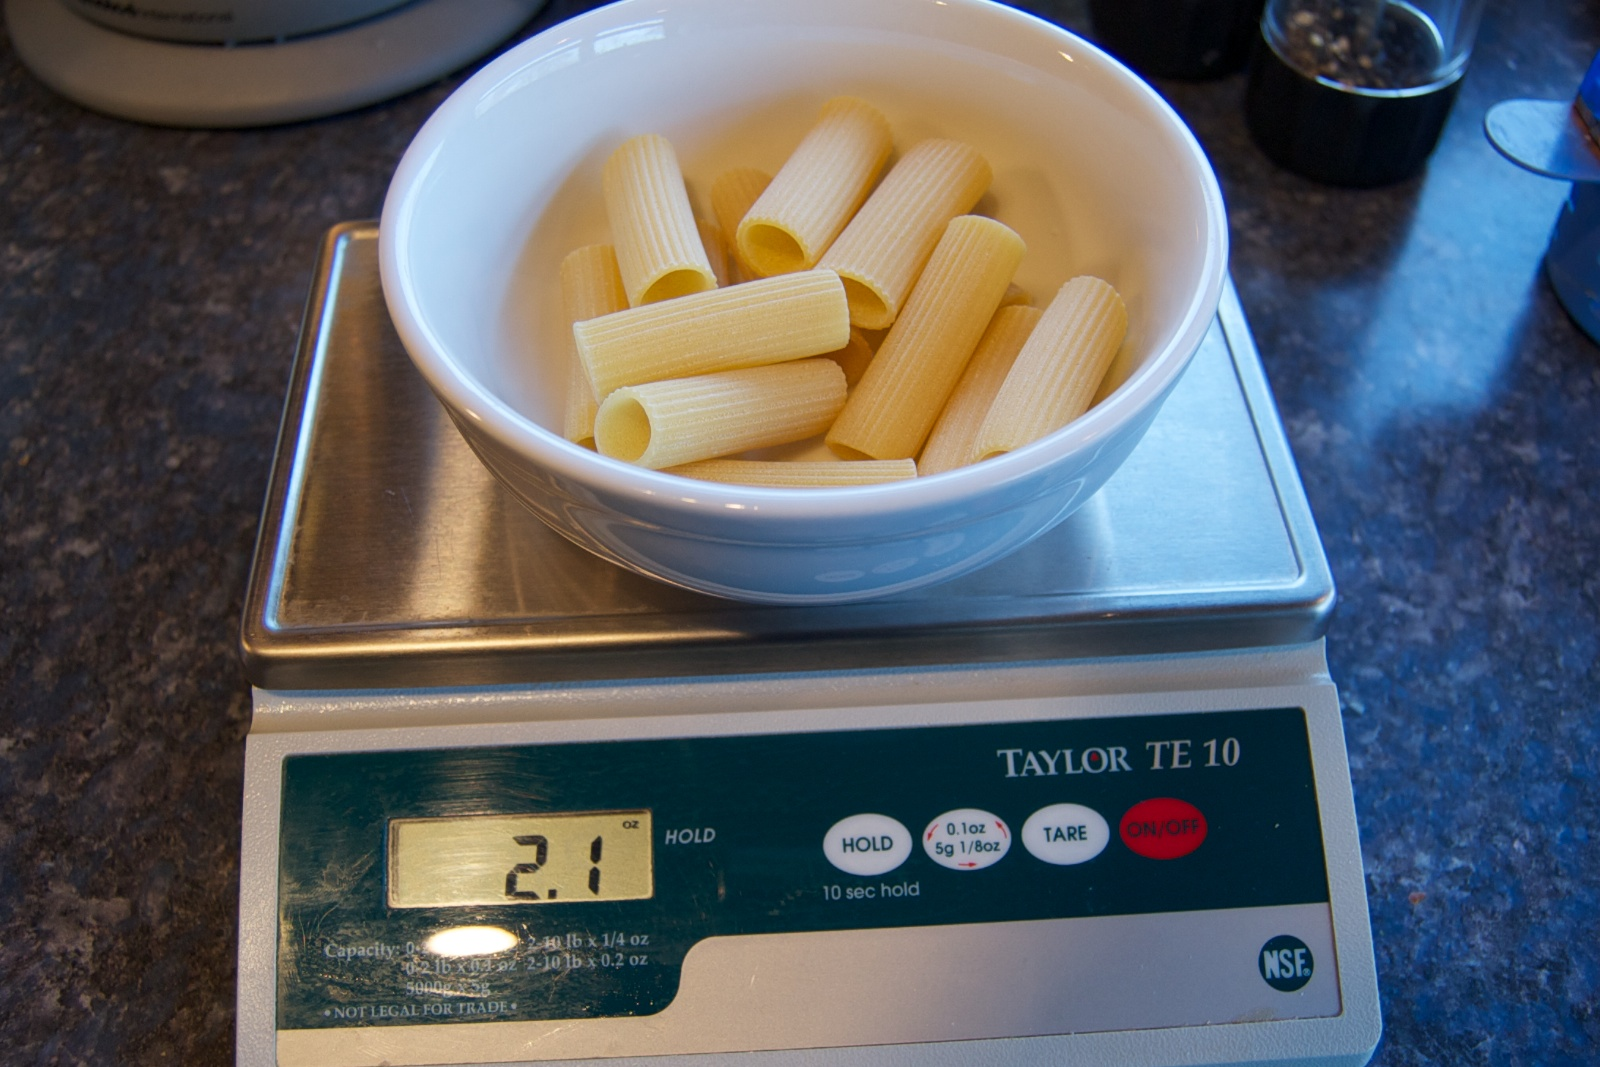 http://blog.rickk.com/food/2012/01/31/ate.2012.01.31.c.jpg